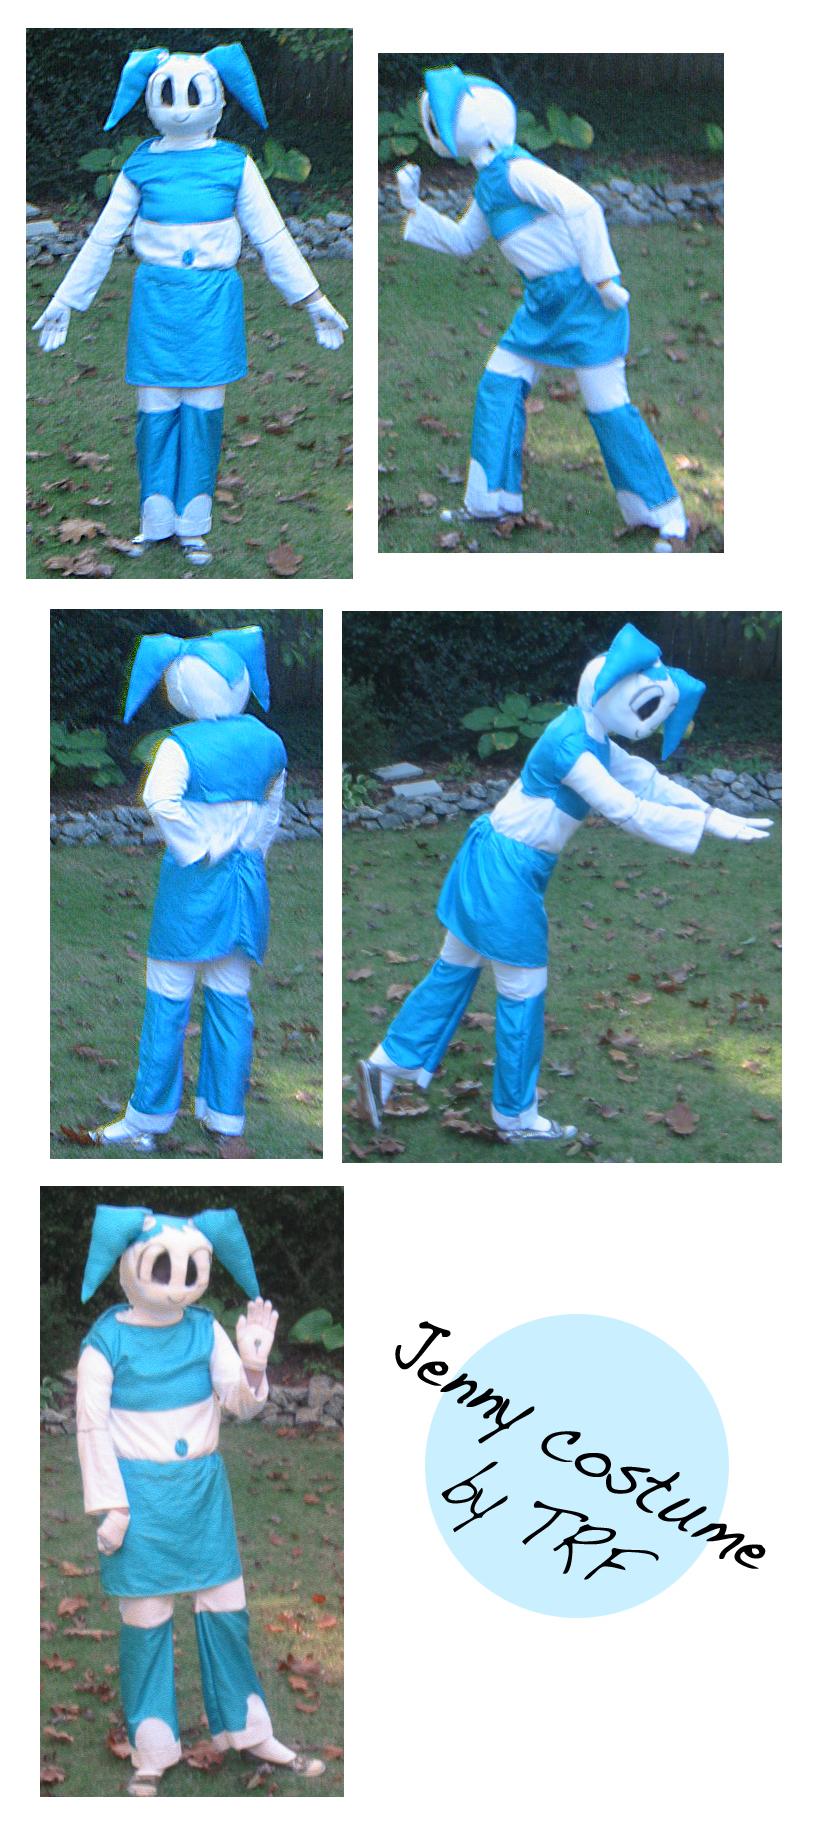 Jenny costume 2.0 by teenagerobotfan777